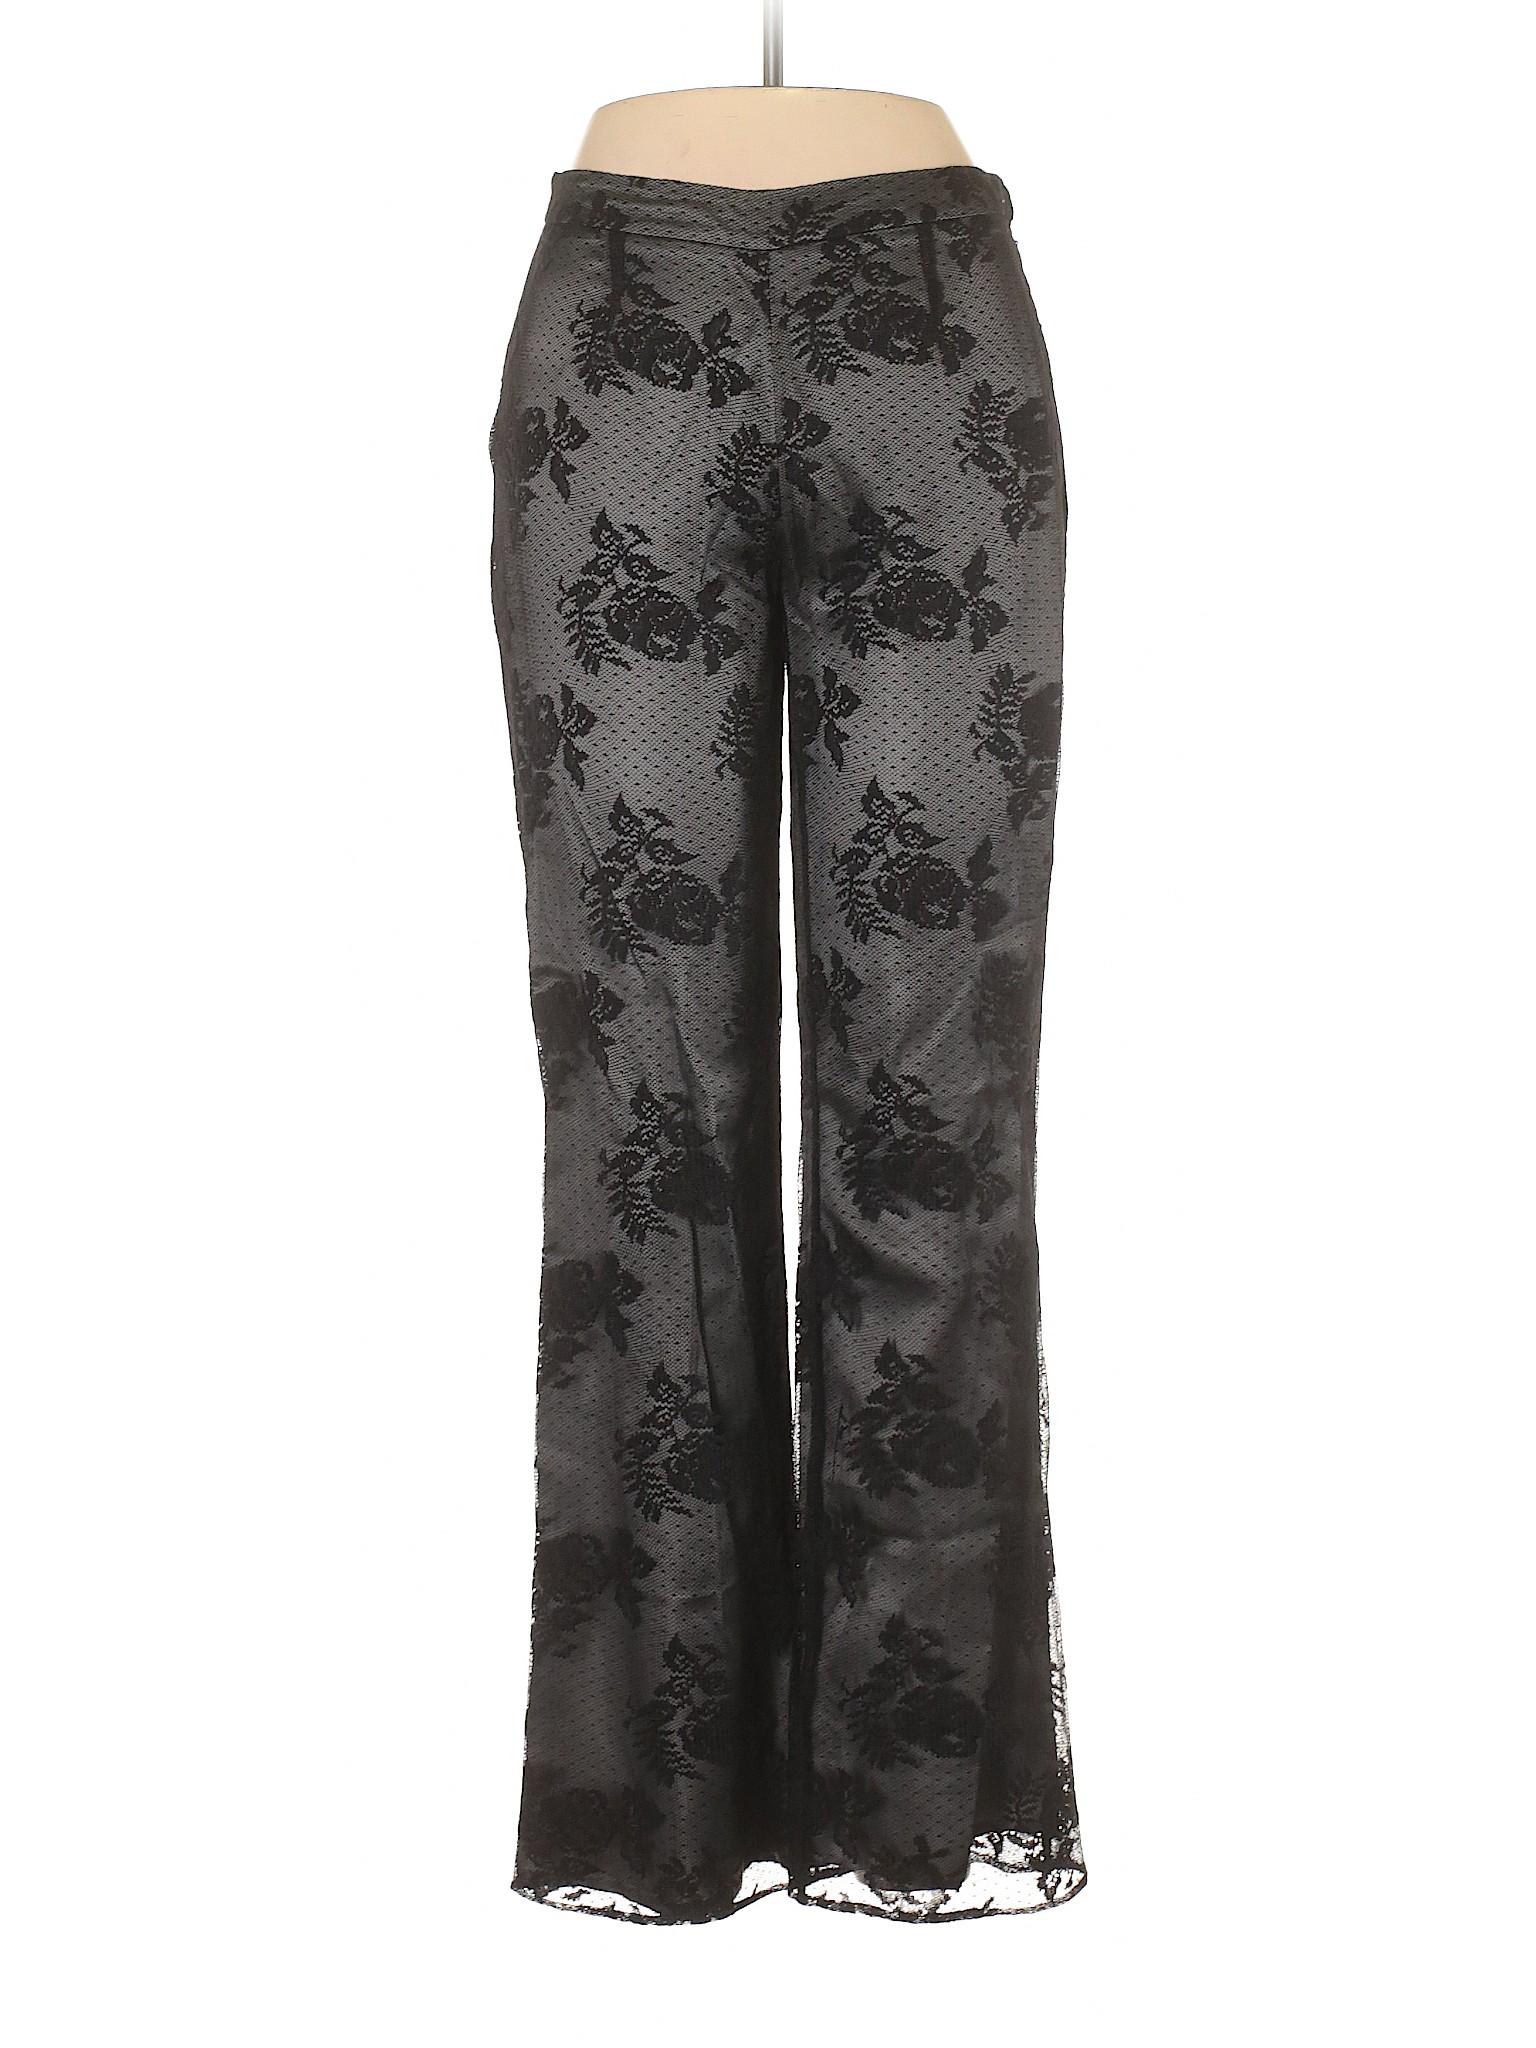 Boutique Copains winter Casual Pants Les qXTrnq